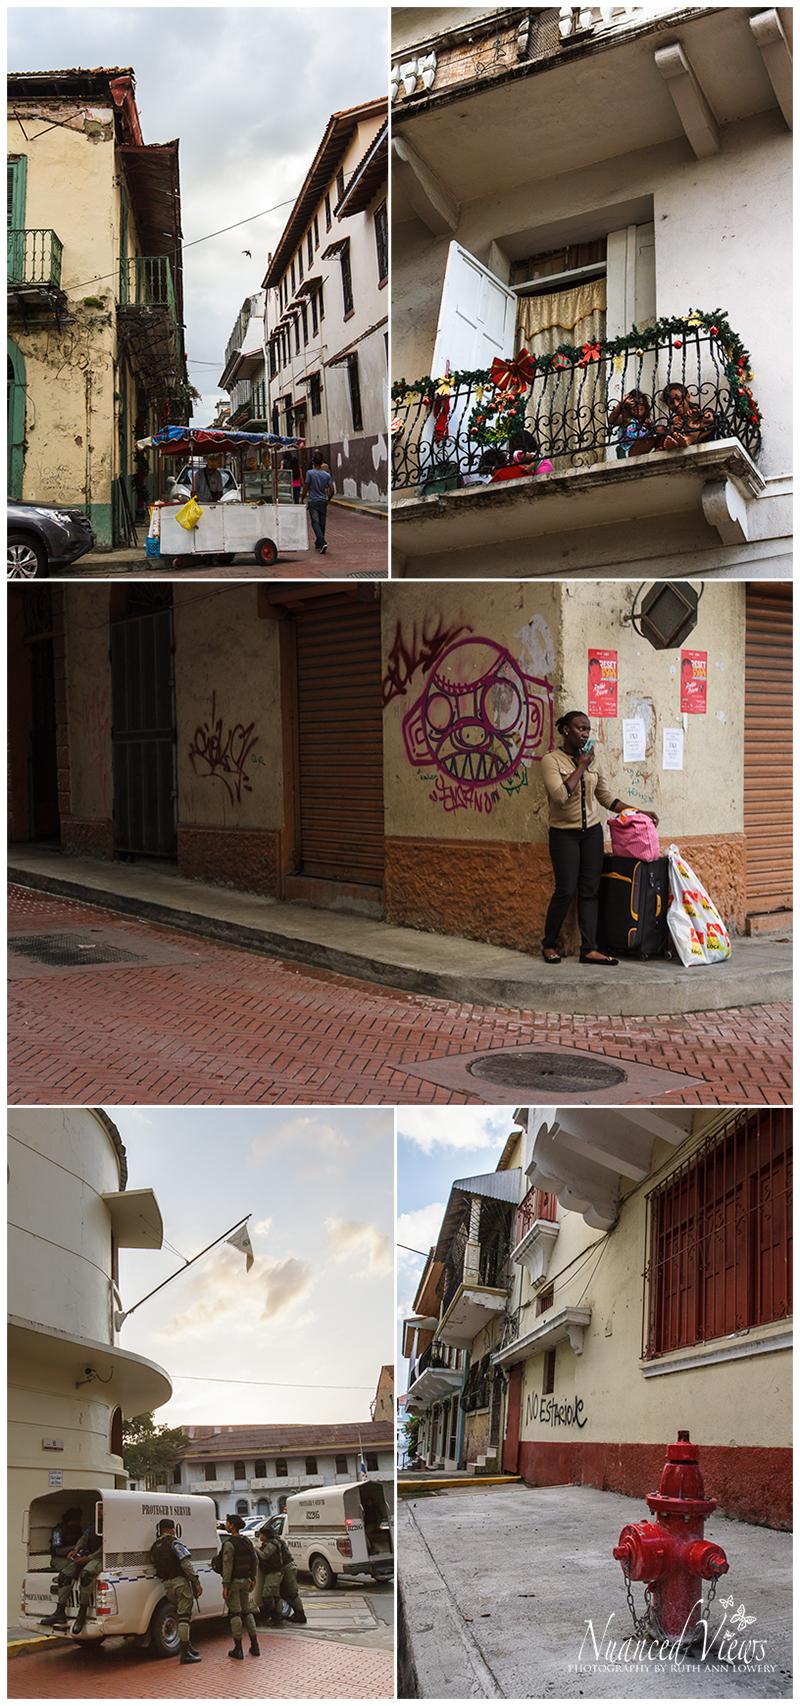 Blog-Collage-1389231824295.jpg